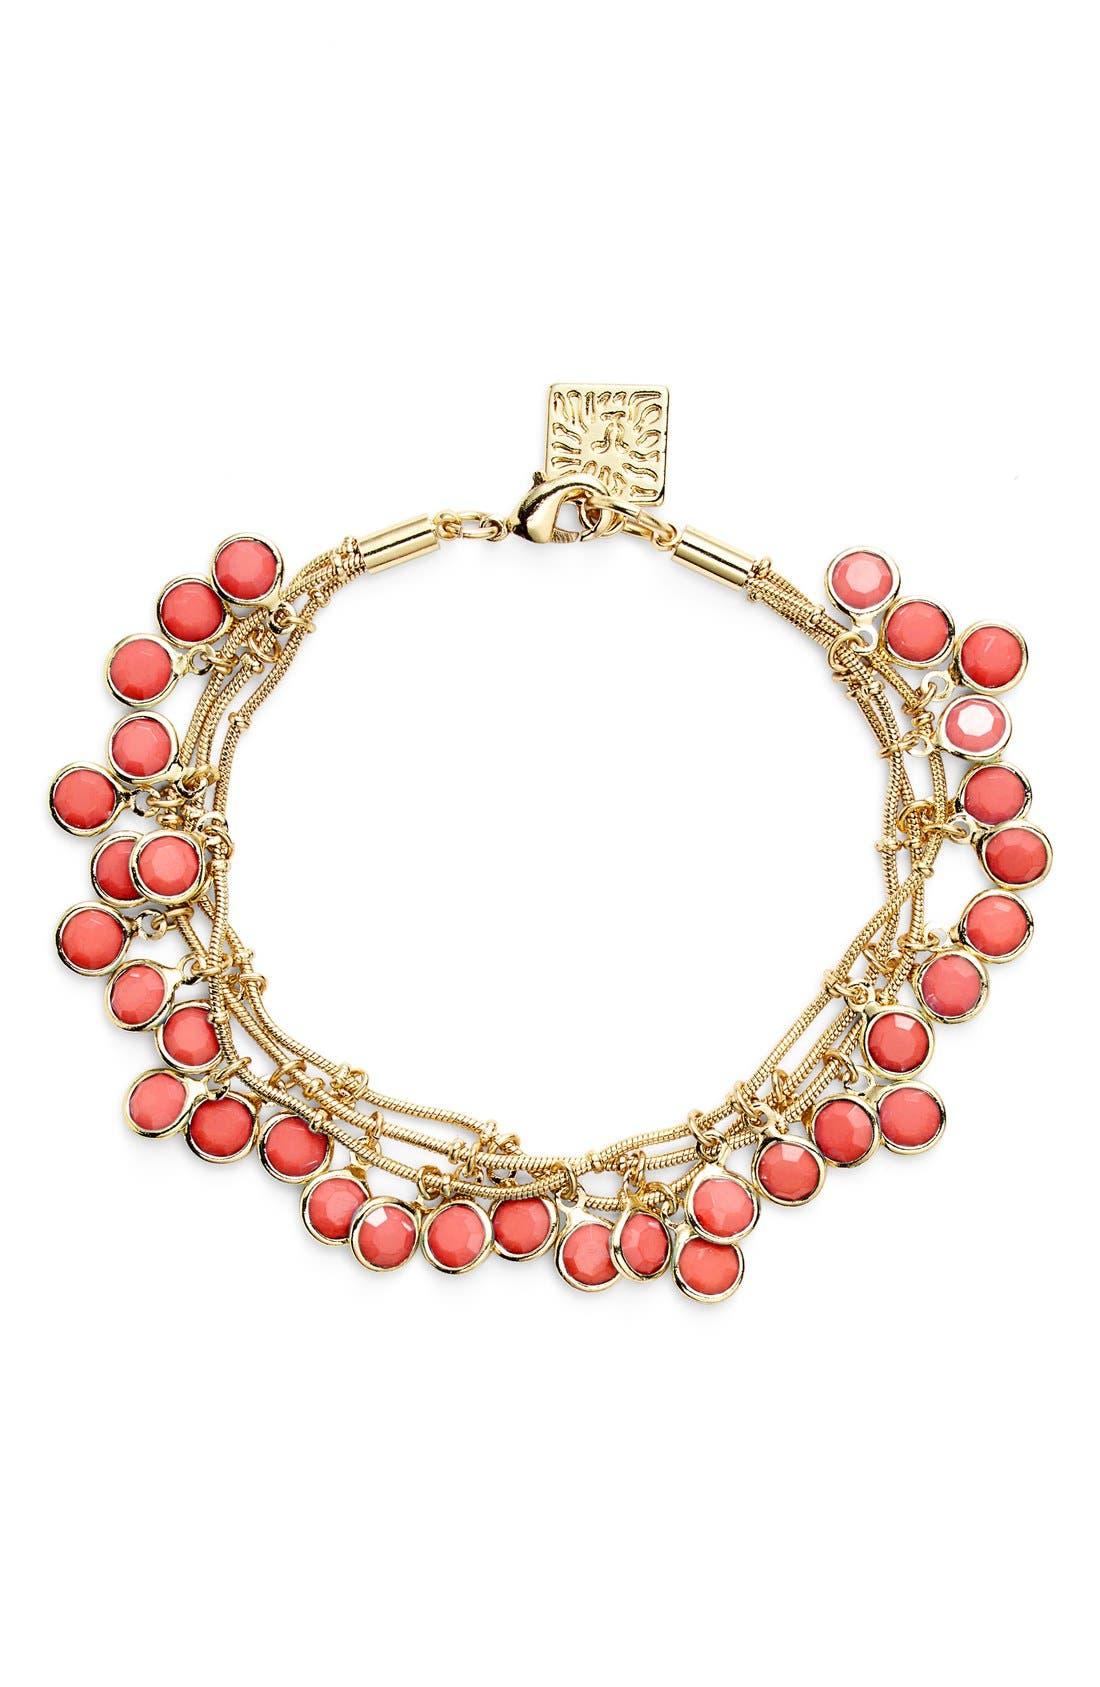 Alternate Image 1 Selected - Anne Klein 'Beacon Ct.' Multistrand Charm Bracelet